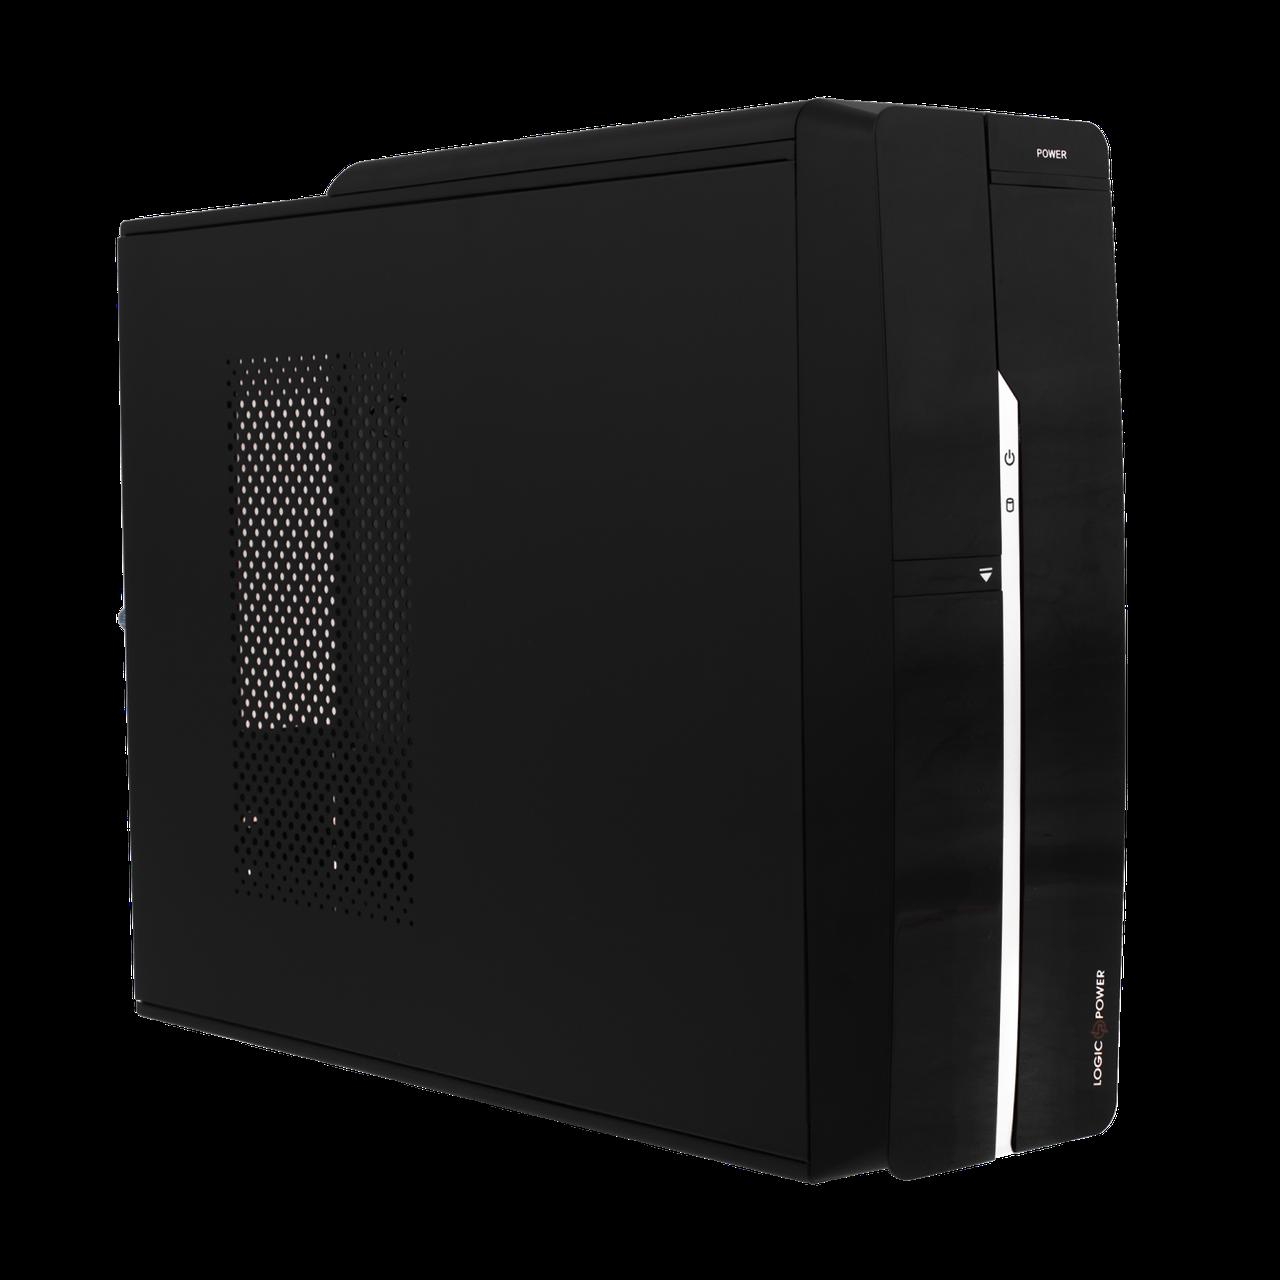 Компьютер < Юниор > (2x3,2Ghz/4/ssd-240/vega3) Athlon 200GE